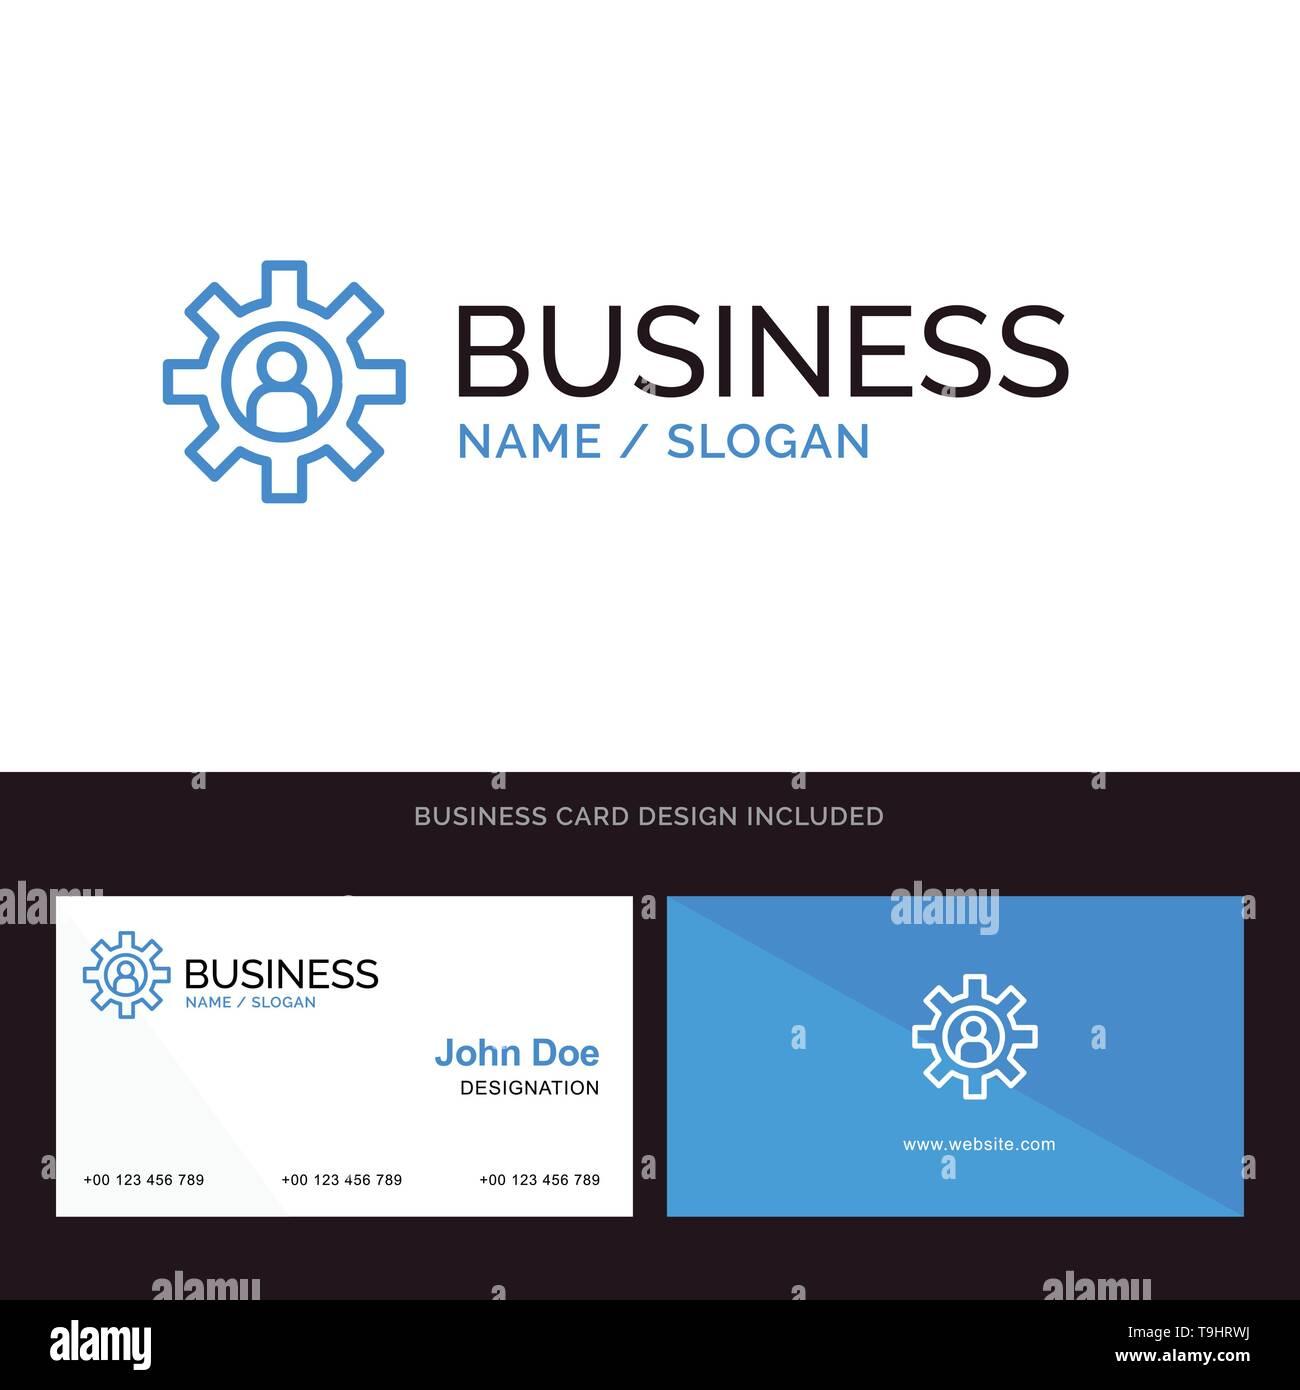 Customer Support, Employee, Service, Support Blue Business logo Regarding Customer Information Card Template